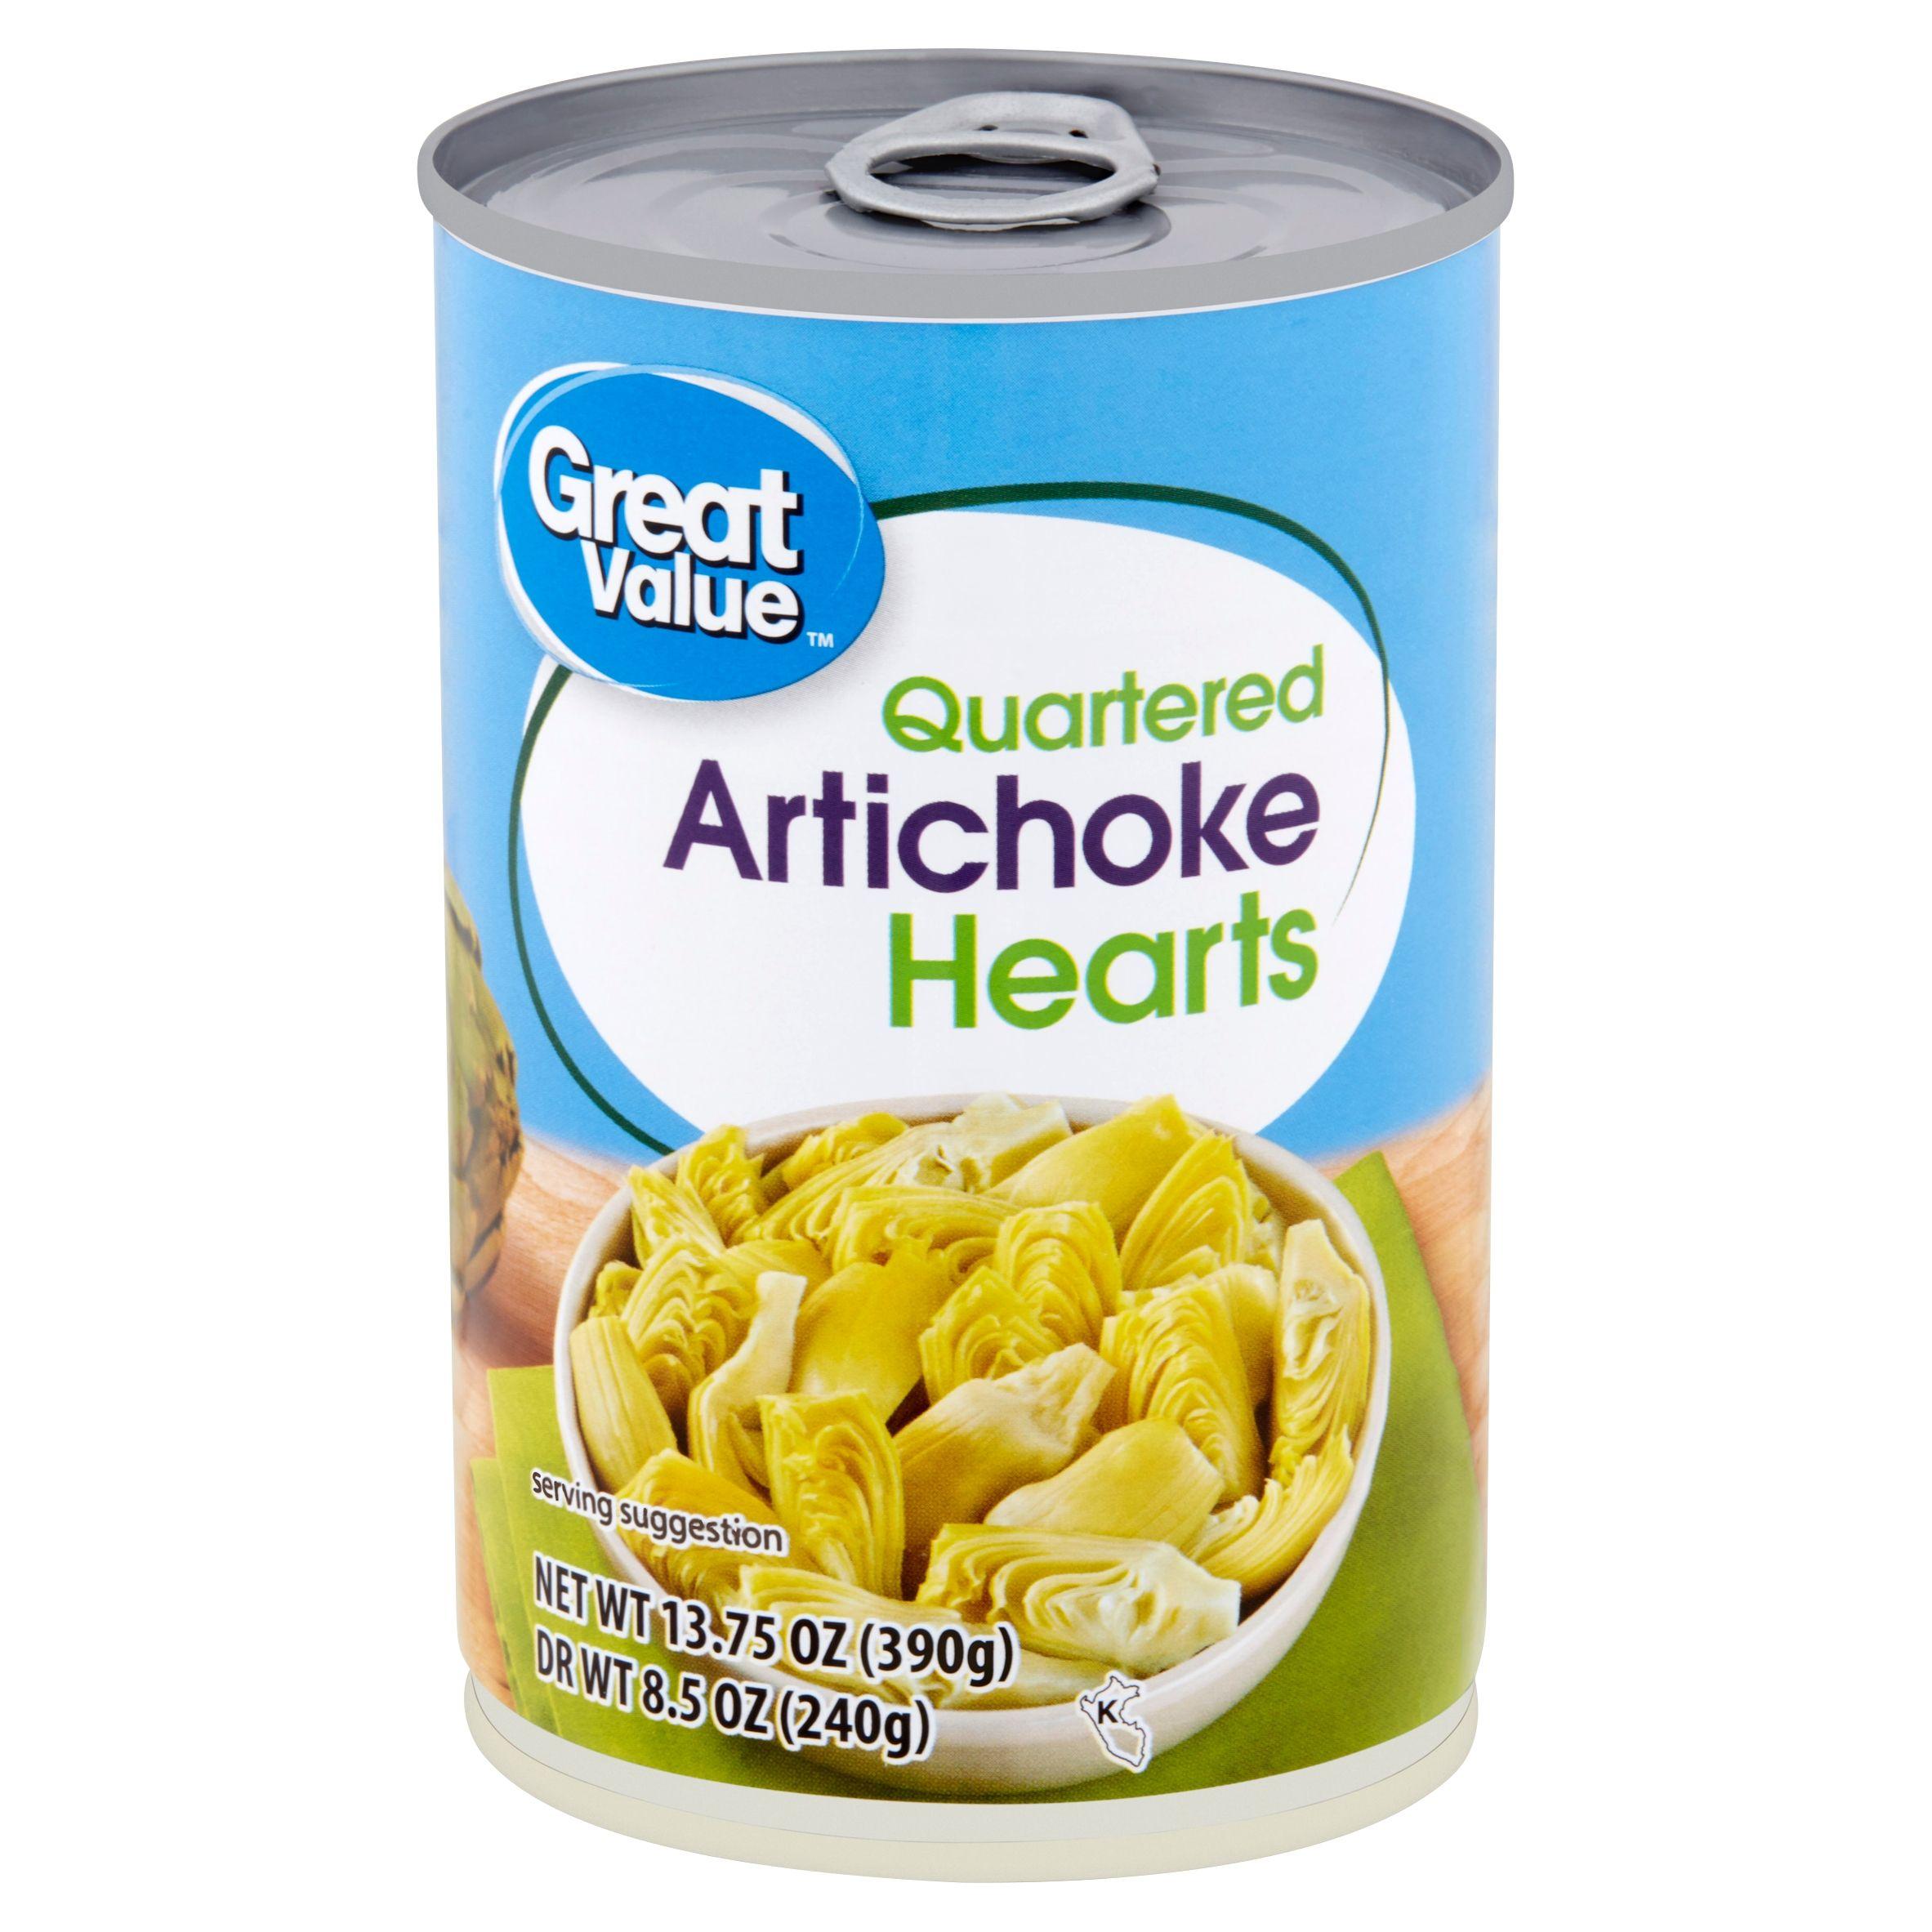 Great Value Quartered Artichoke Hearts, 13.75 oz Walmart